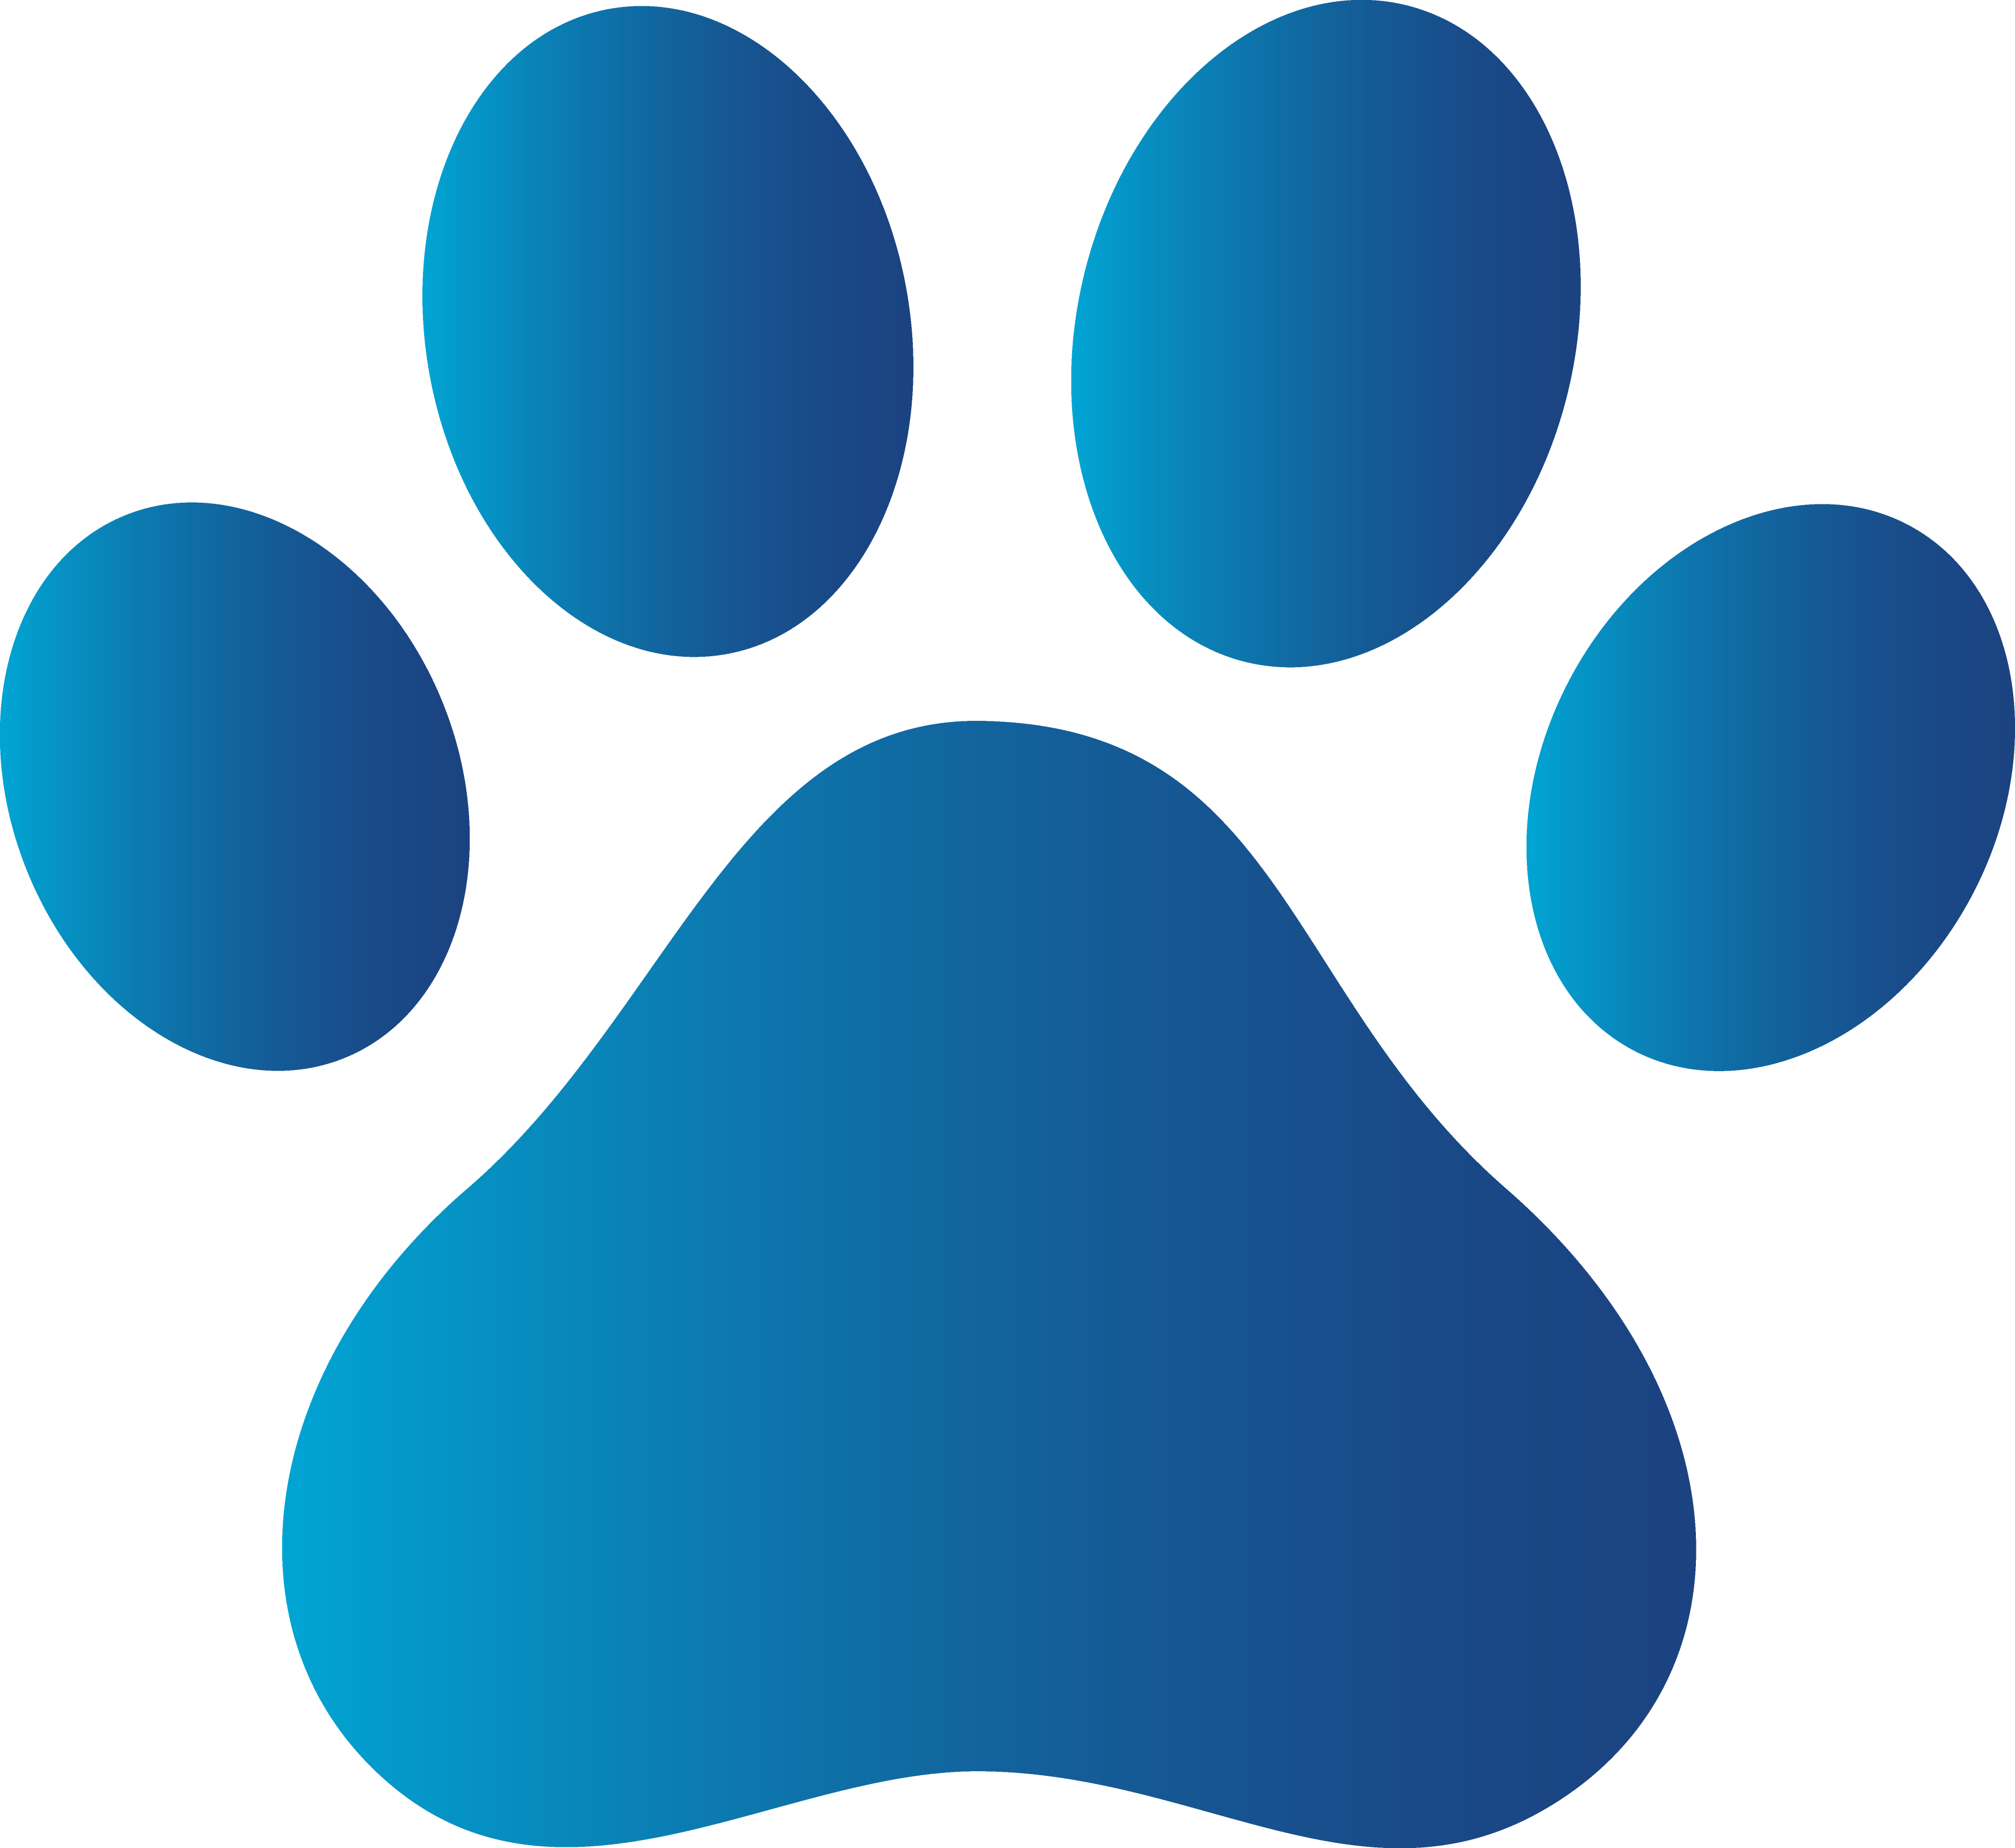 free clip art Blue Dog Paw Print Free Clip Art